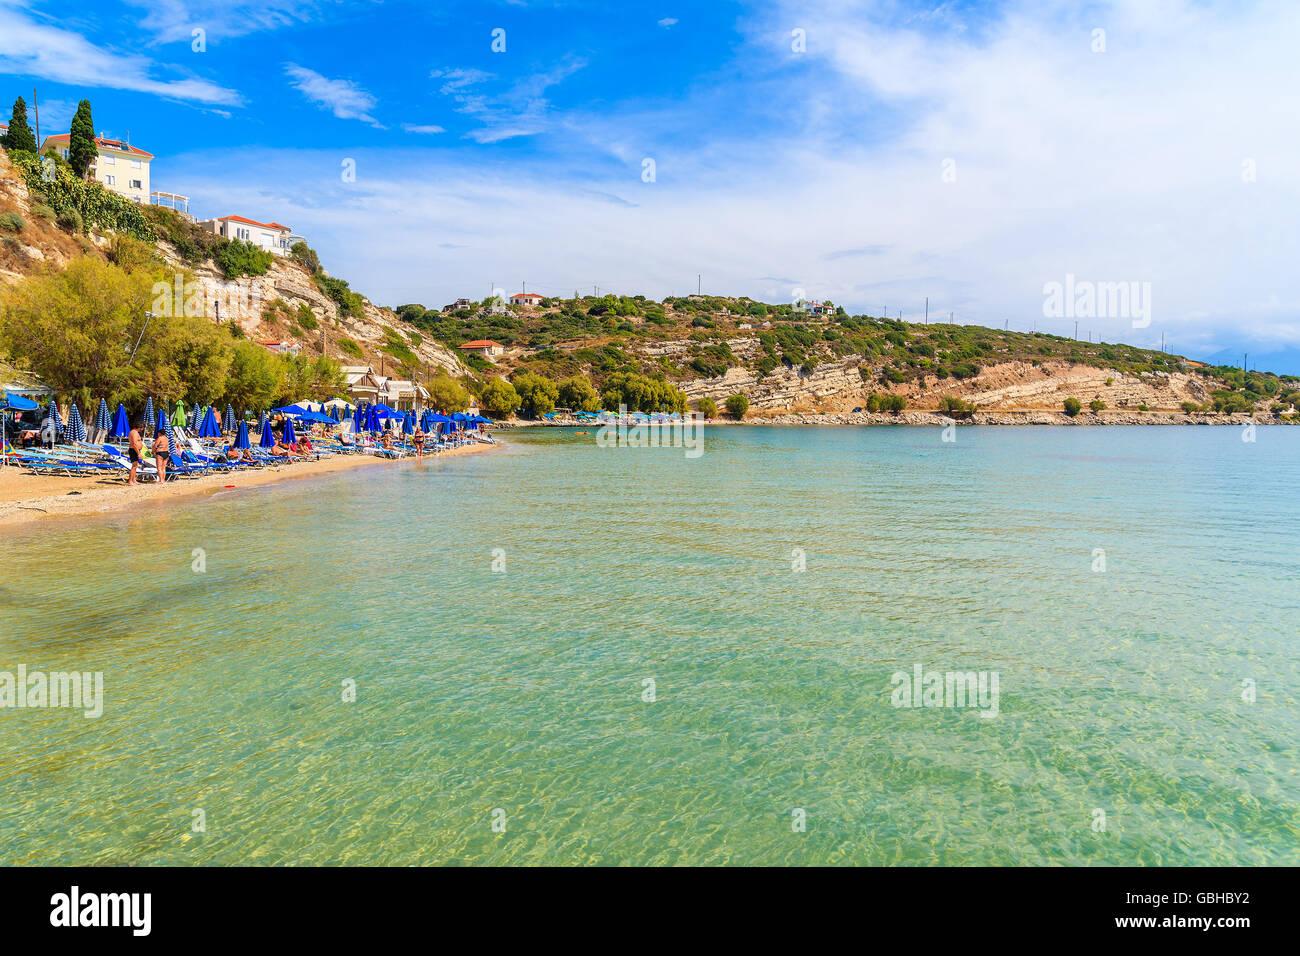 A view of Pythagorion beach, Samos island, Greece Stock Photo